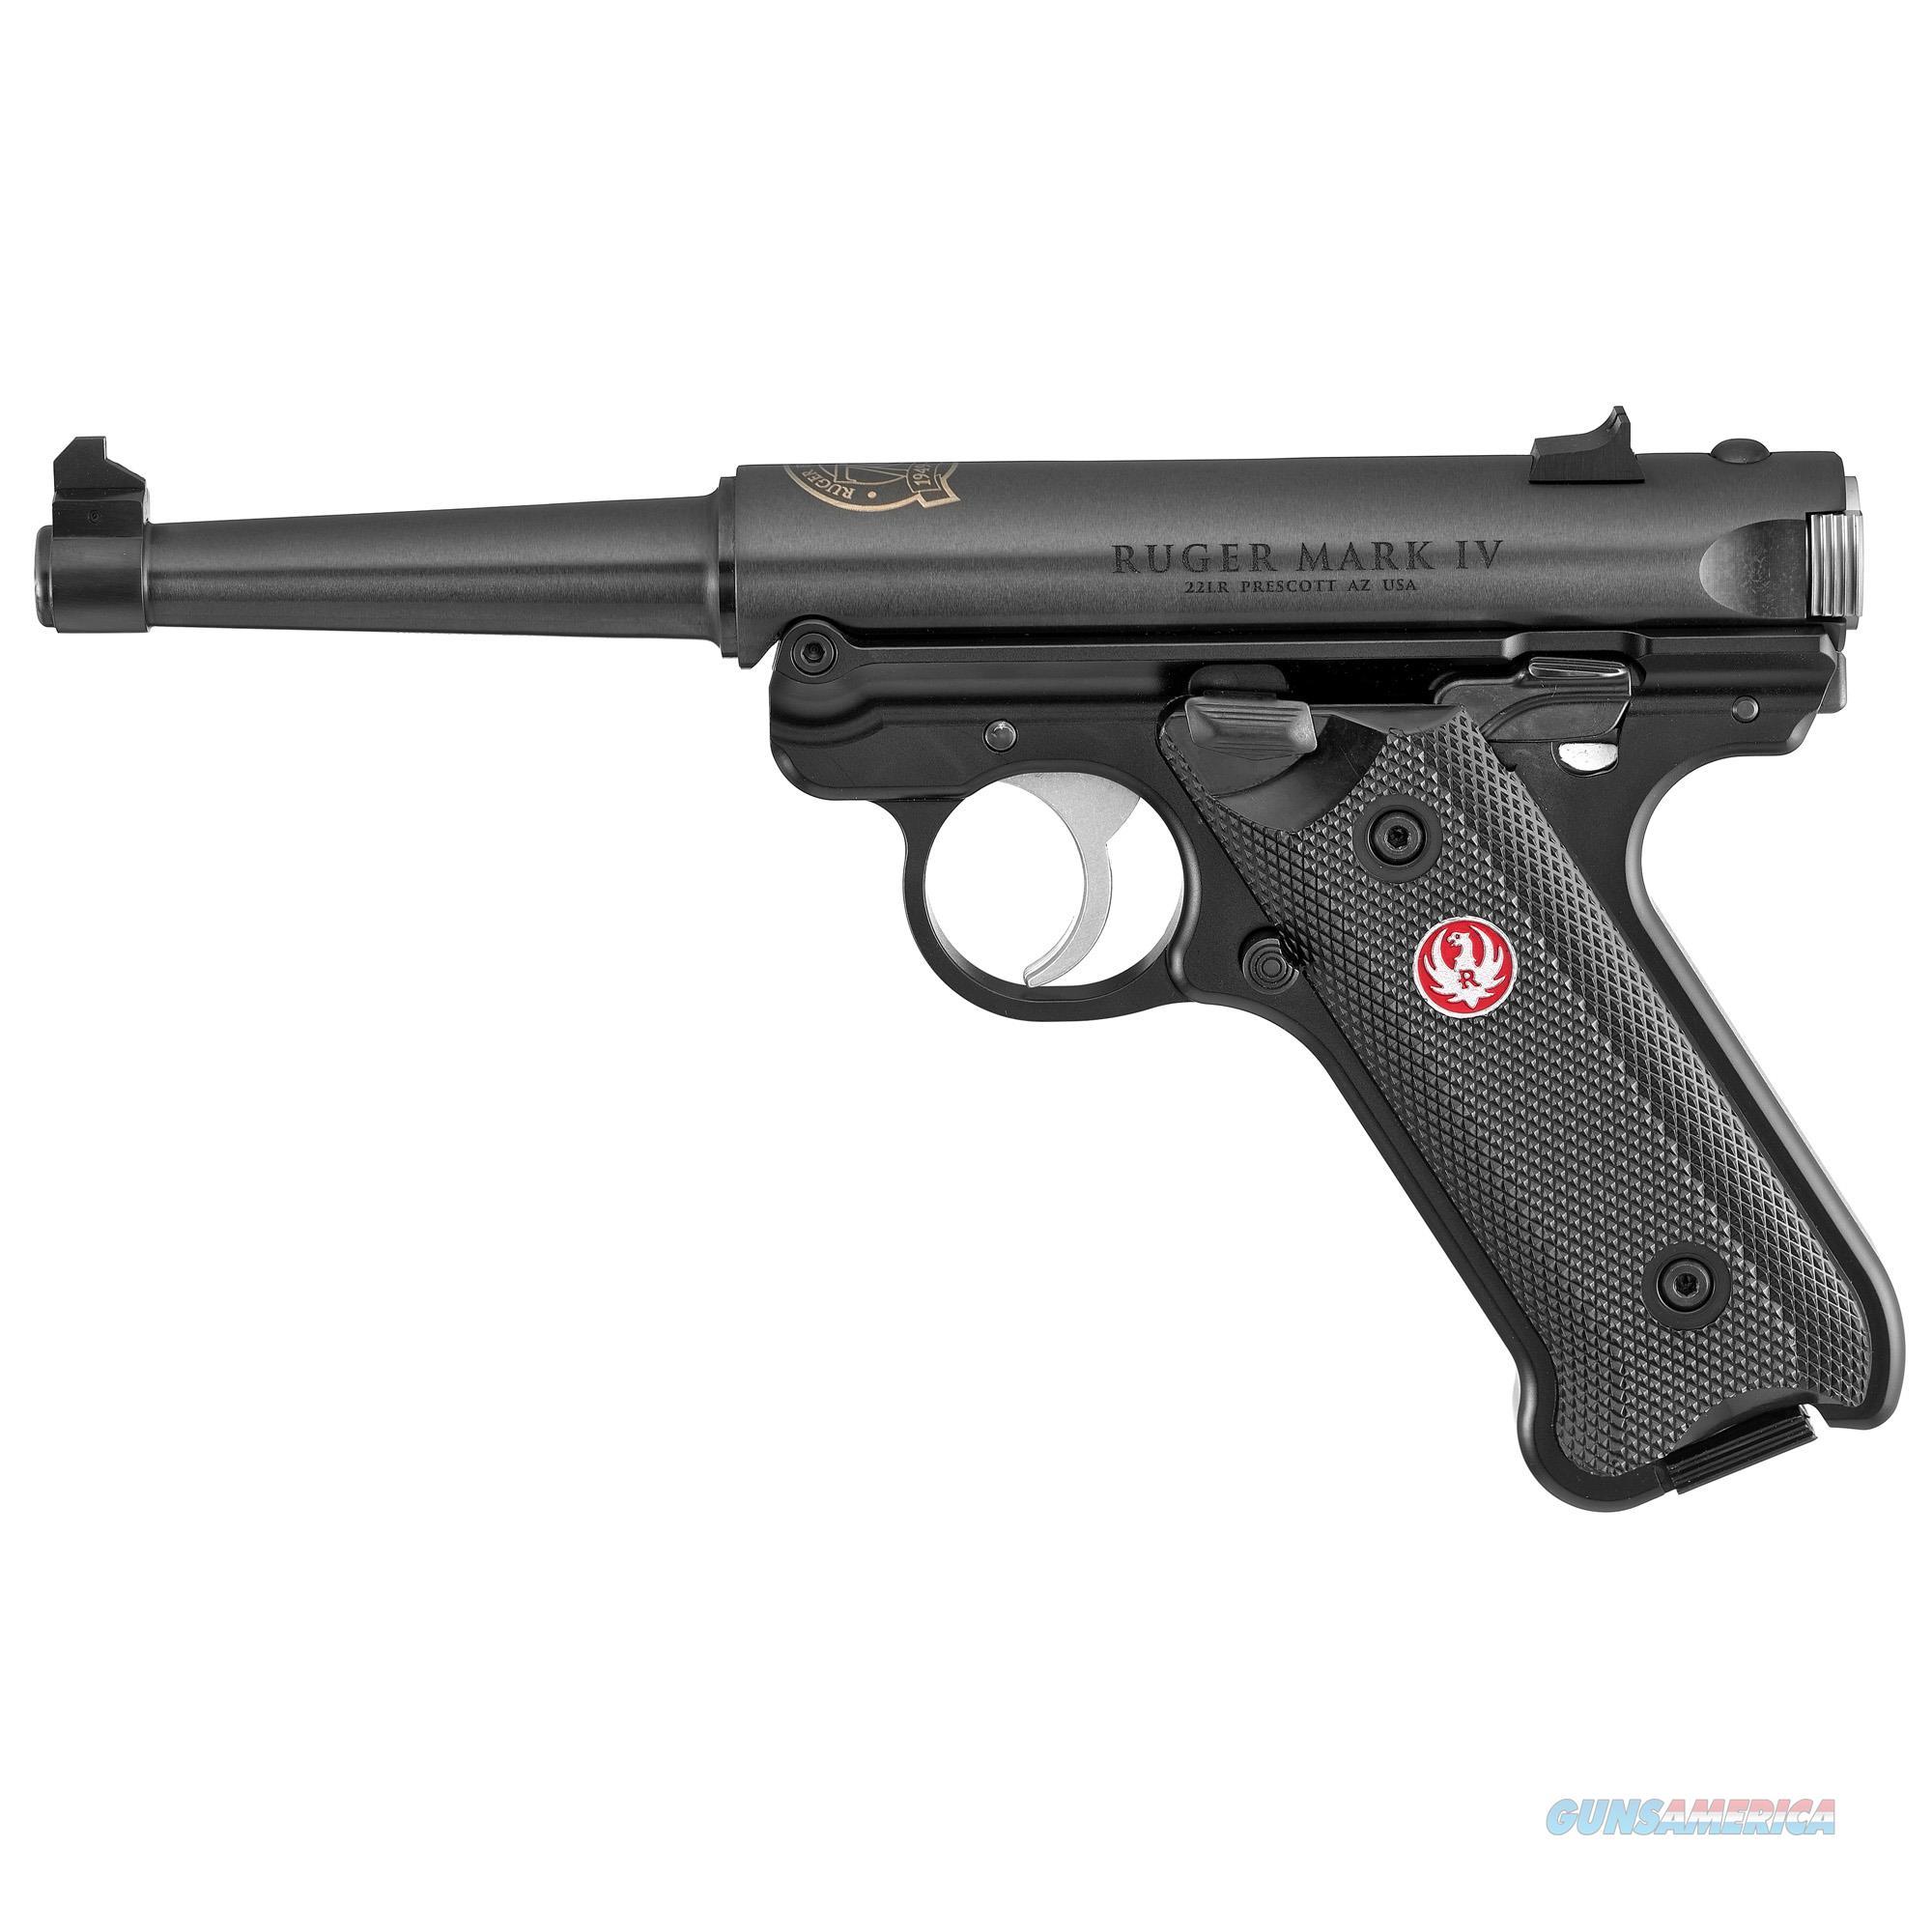 Ruger Mark Iv, Rug 40168 Mkiv  22lr Std 4.75 Fs 70th Anv Bl 10rd  Guns > Pistols > 1911 Pistol Copies (non-Colt)